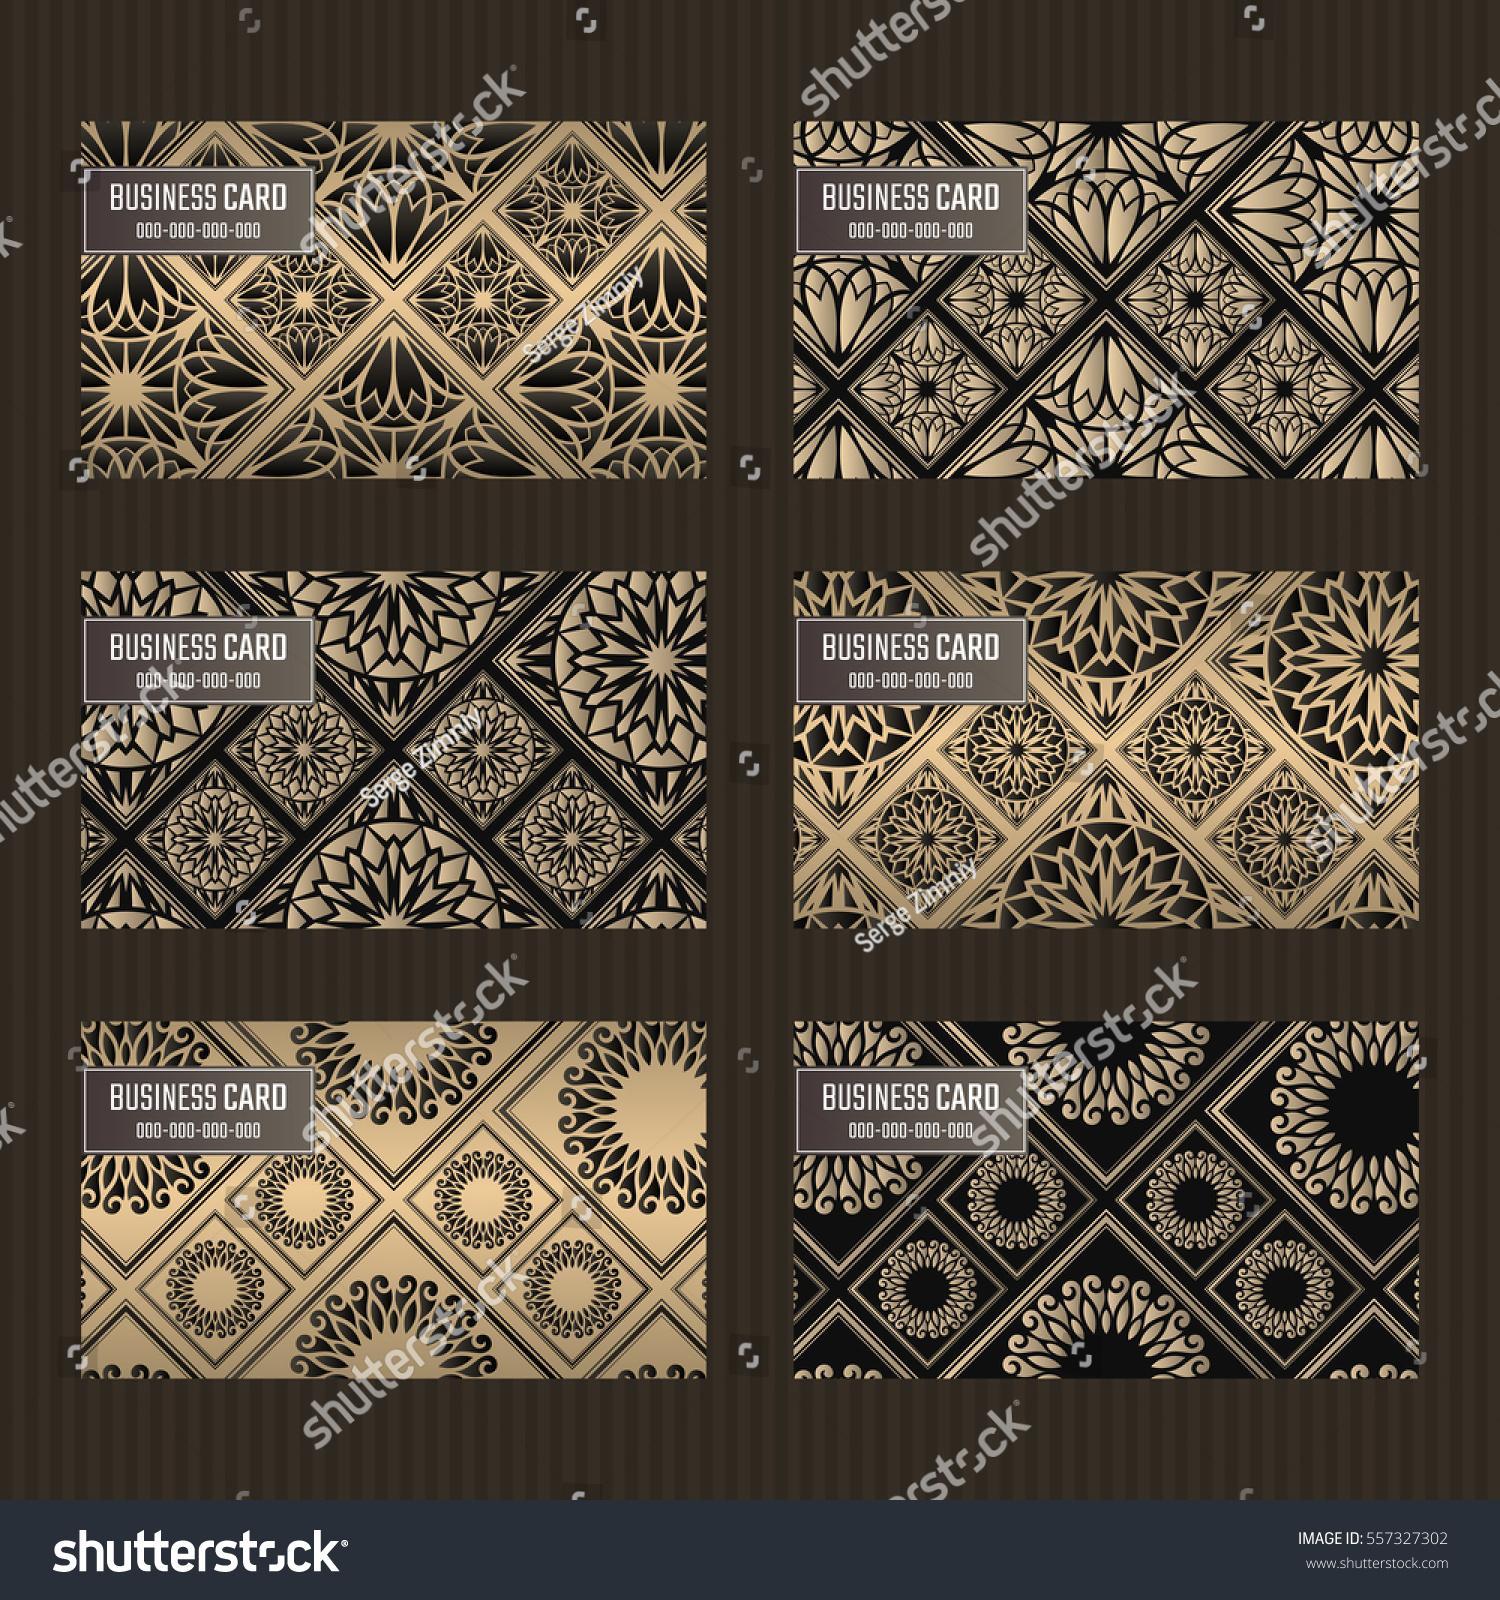 Business Card Set Golden Foil Decorative Stock Vector (2018 ...